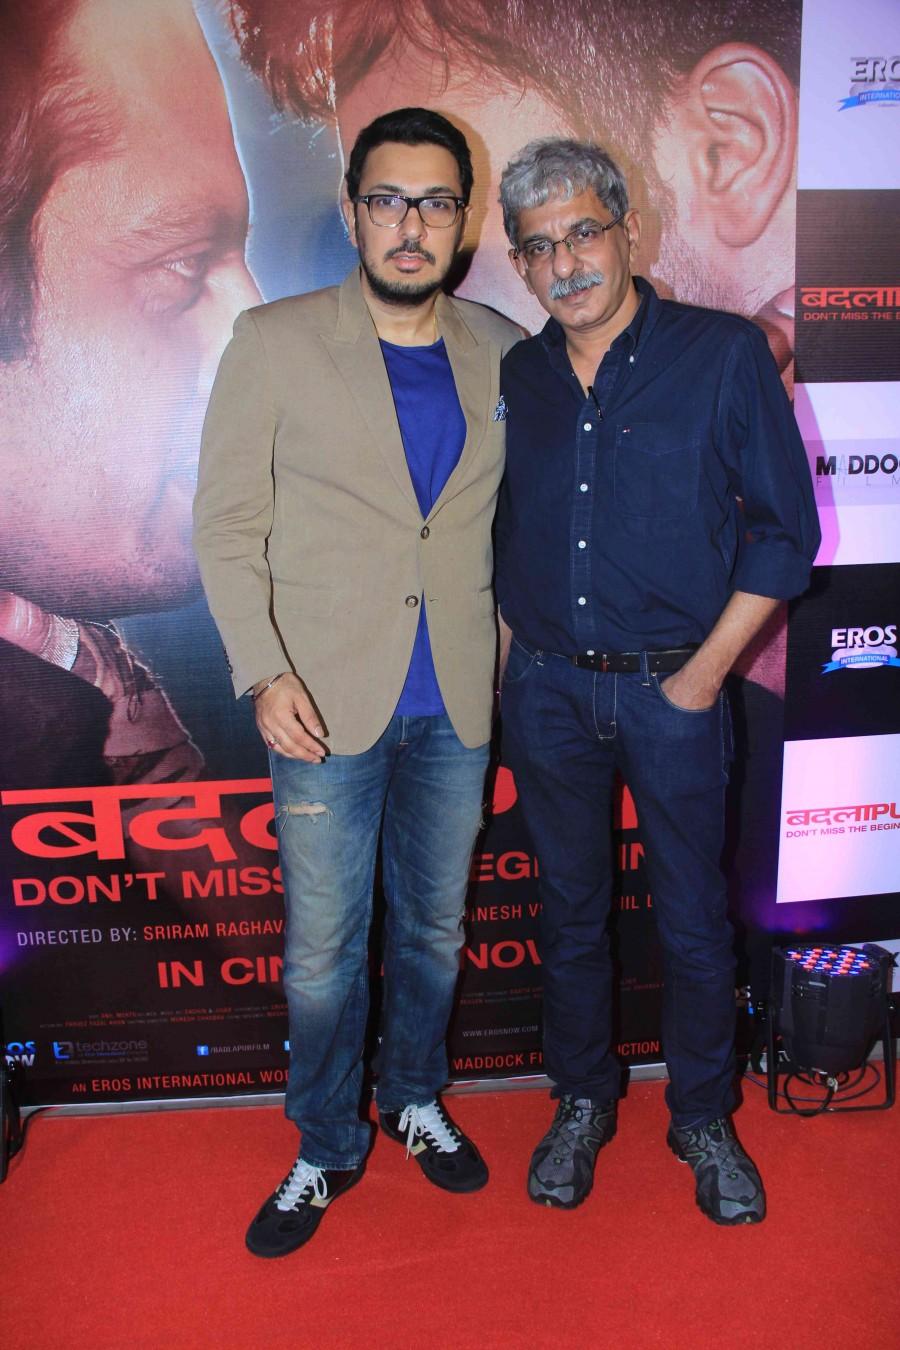 Dinesh Vijan and Sriram Raghawan